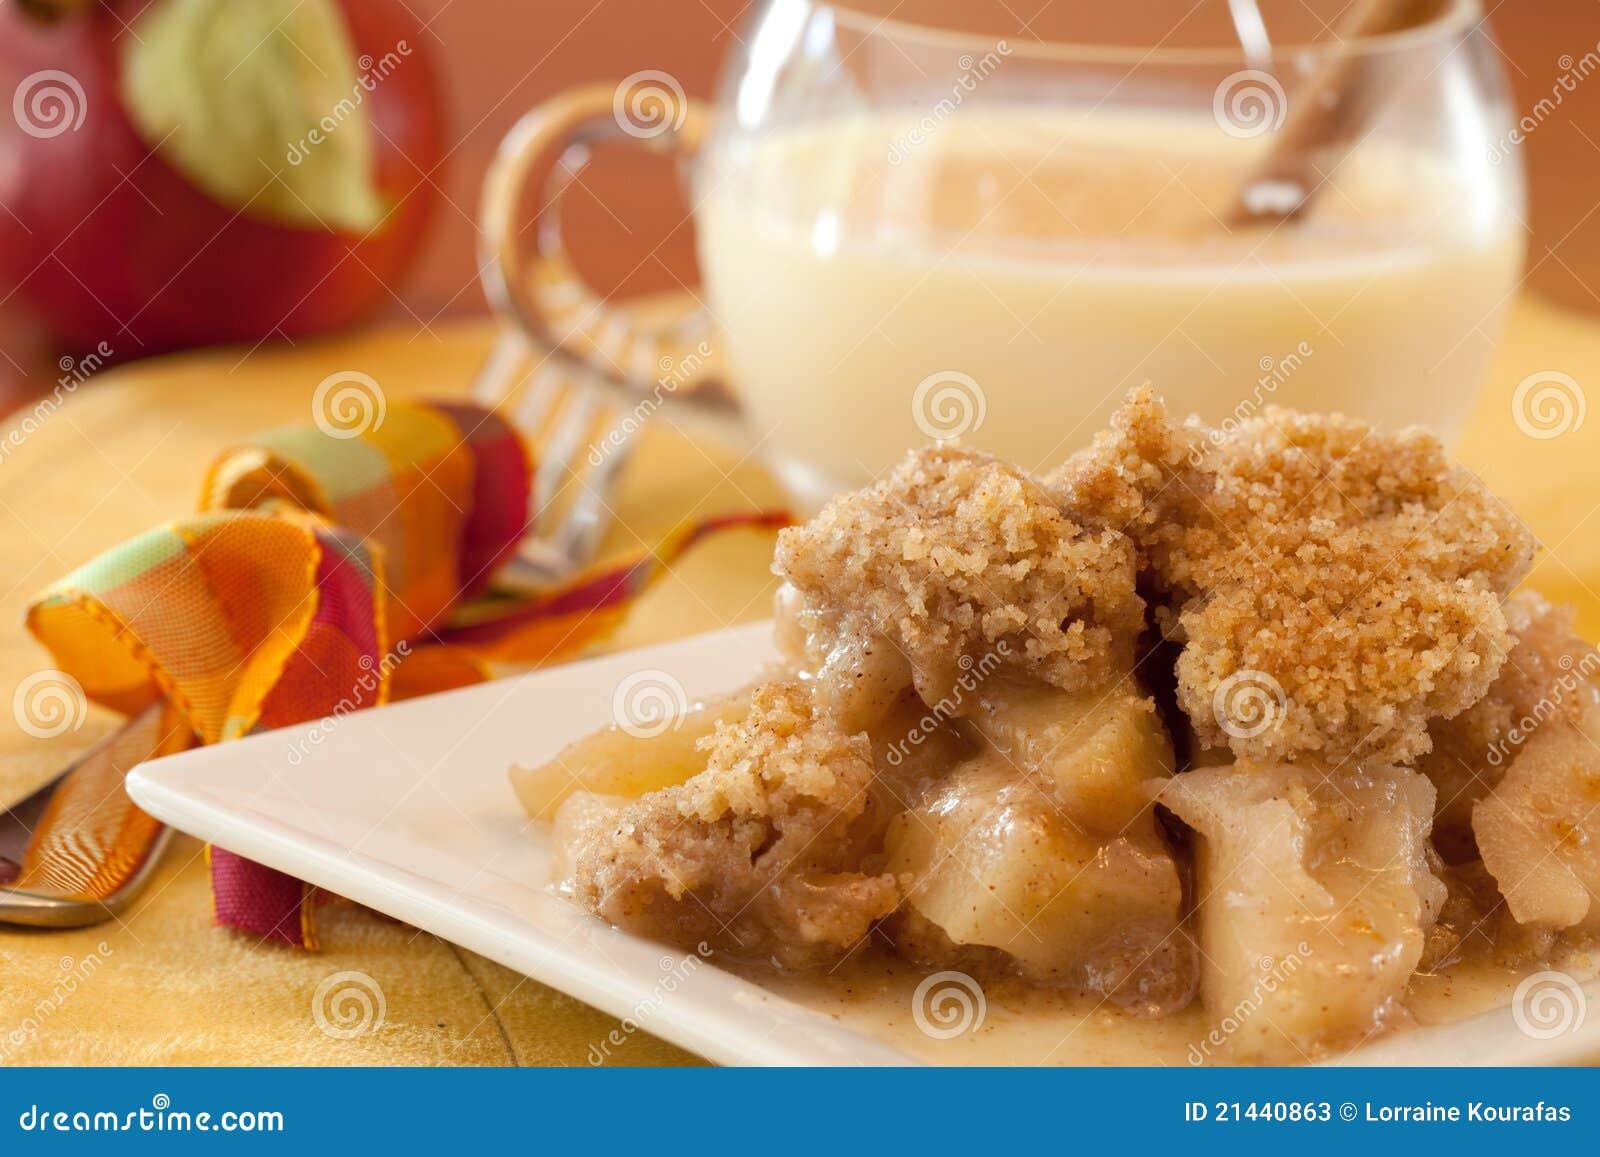 тарелка хрустящей корочки яблока